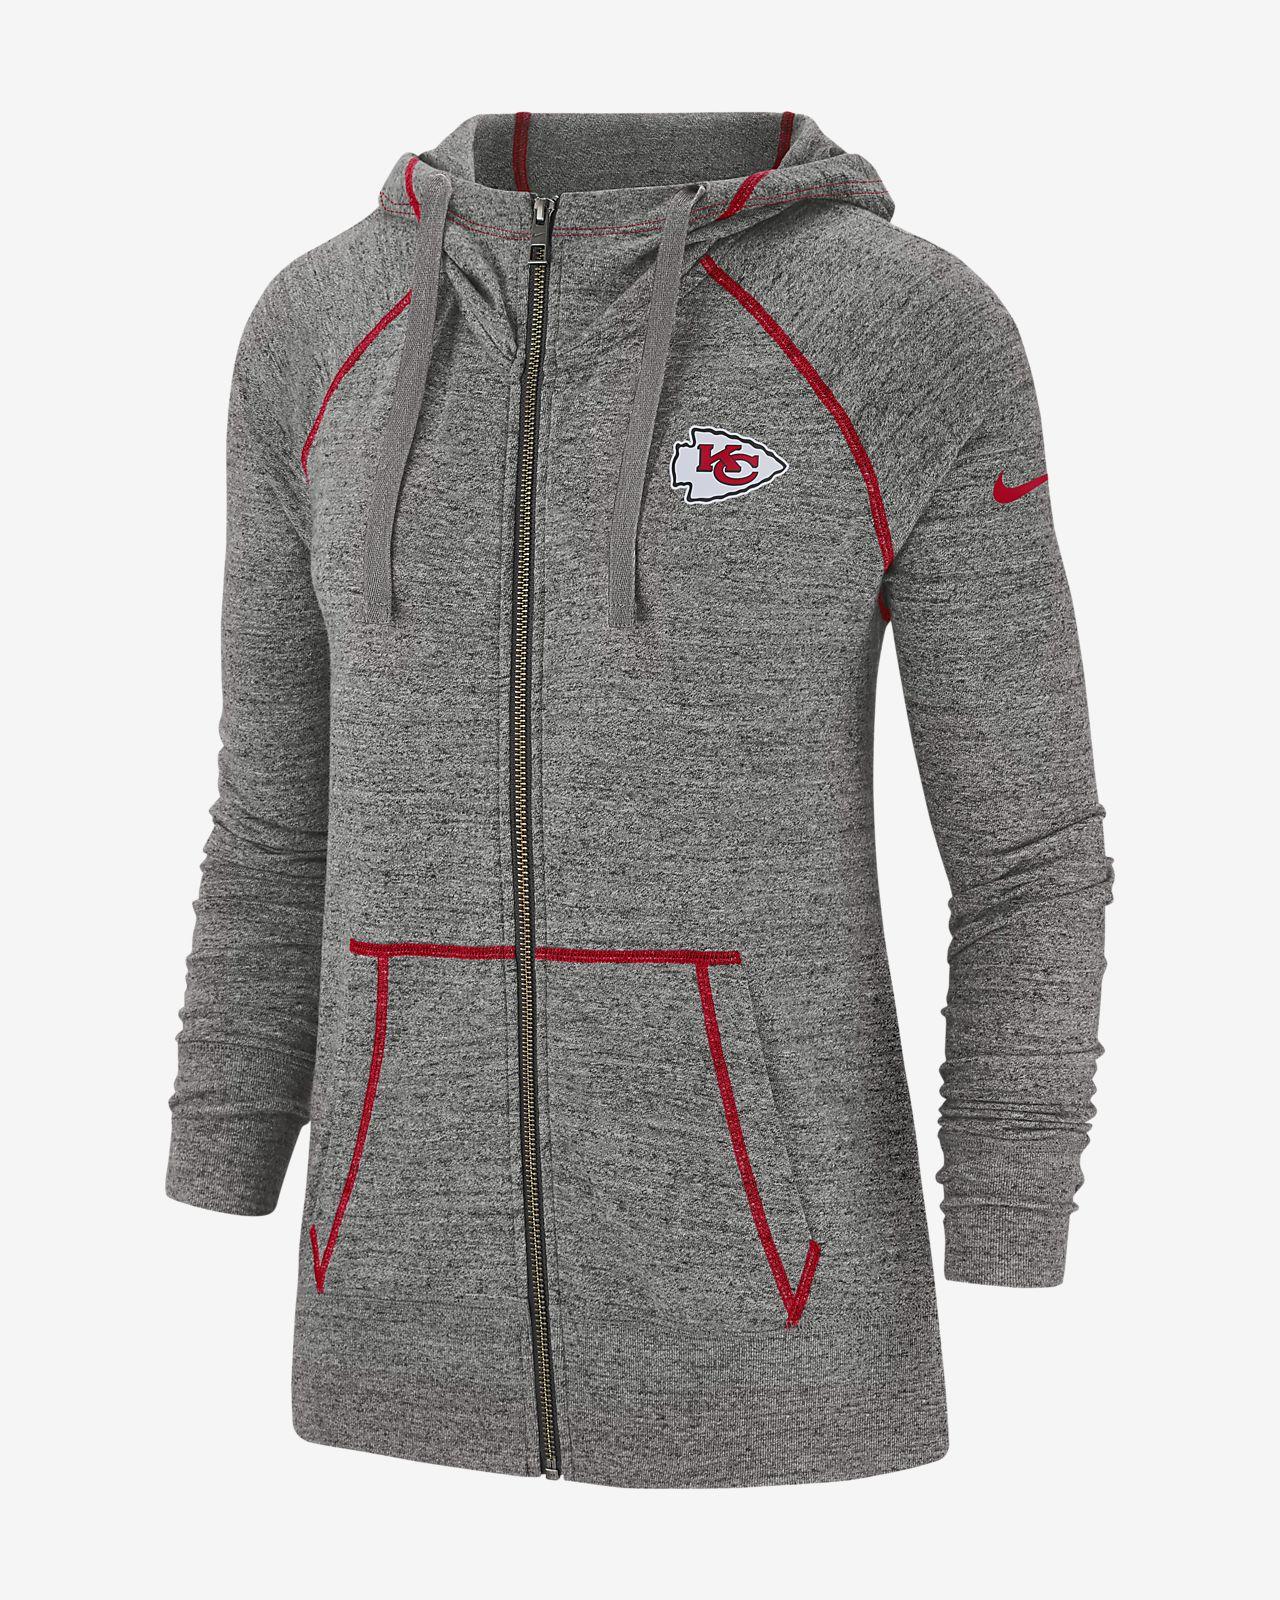 ac8352a2d5d Nike Gym Vintage (NFL Chiefs) Women's Full-Zip Hoodie. Nike.com